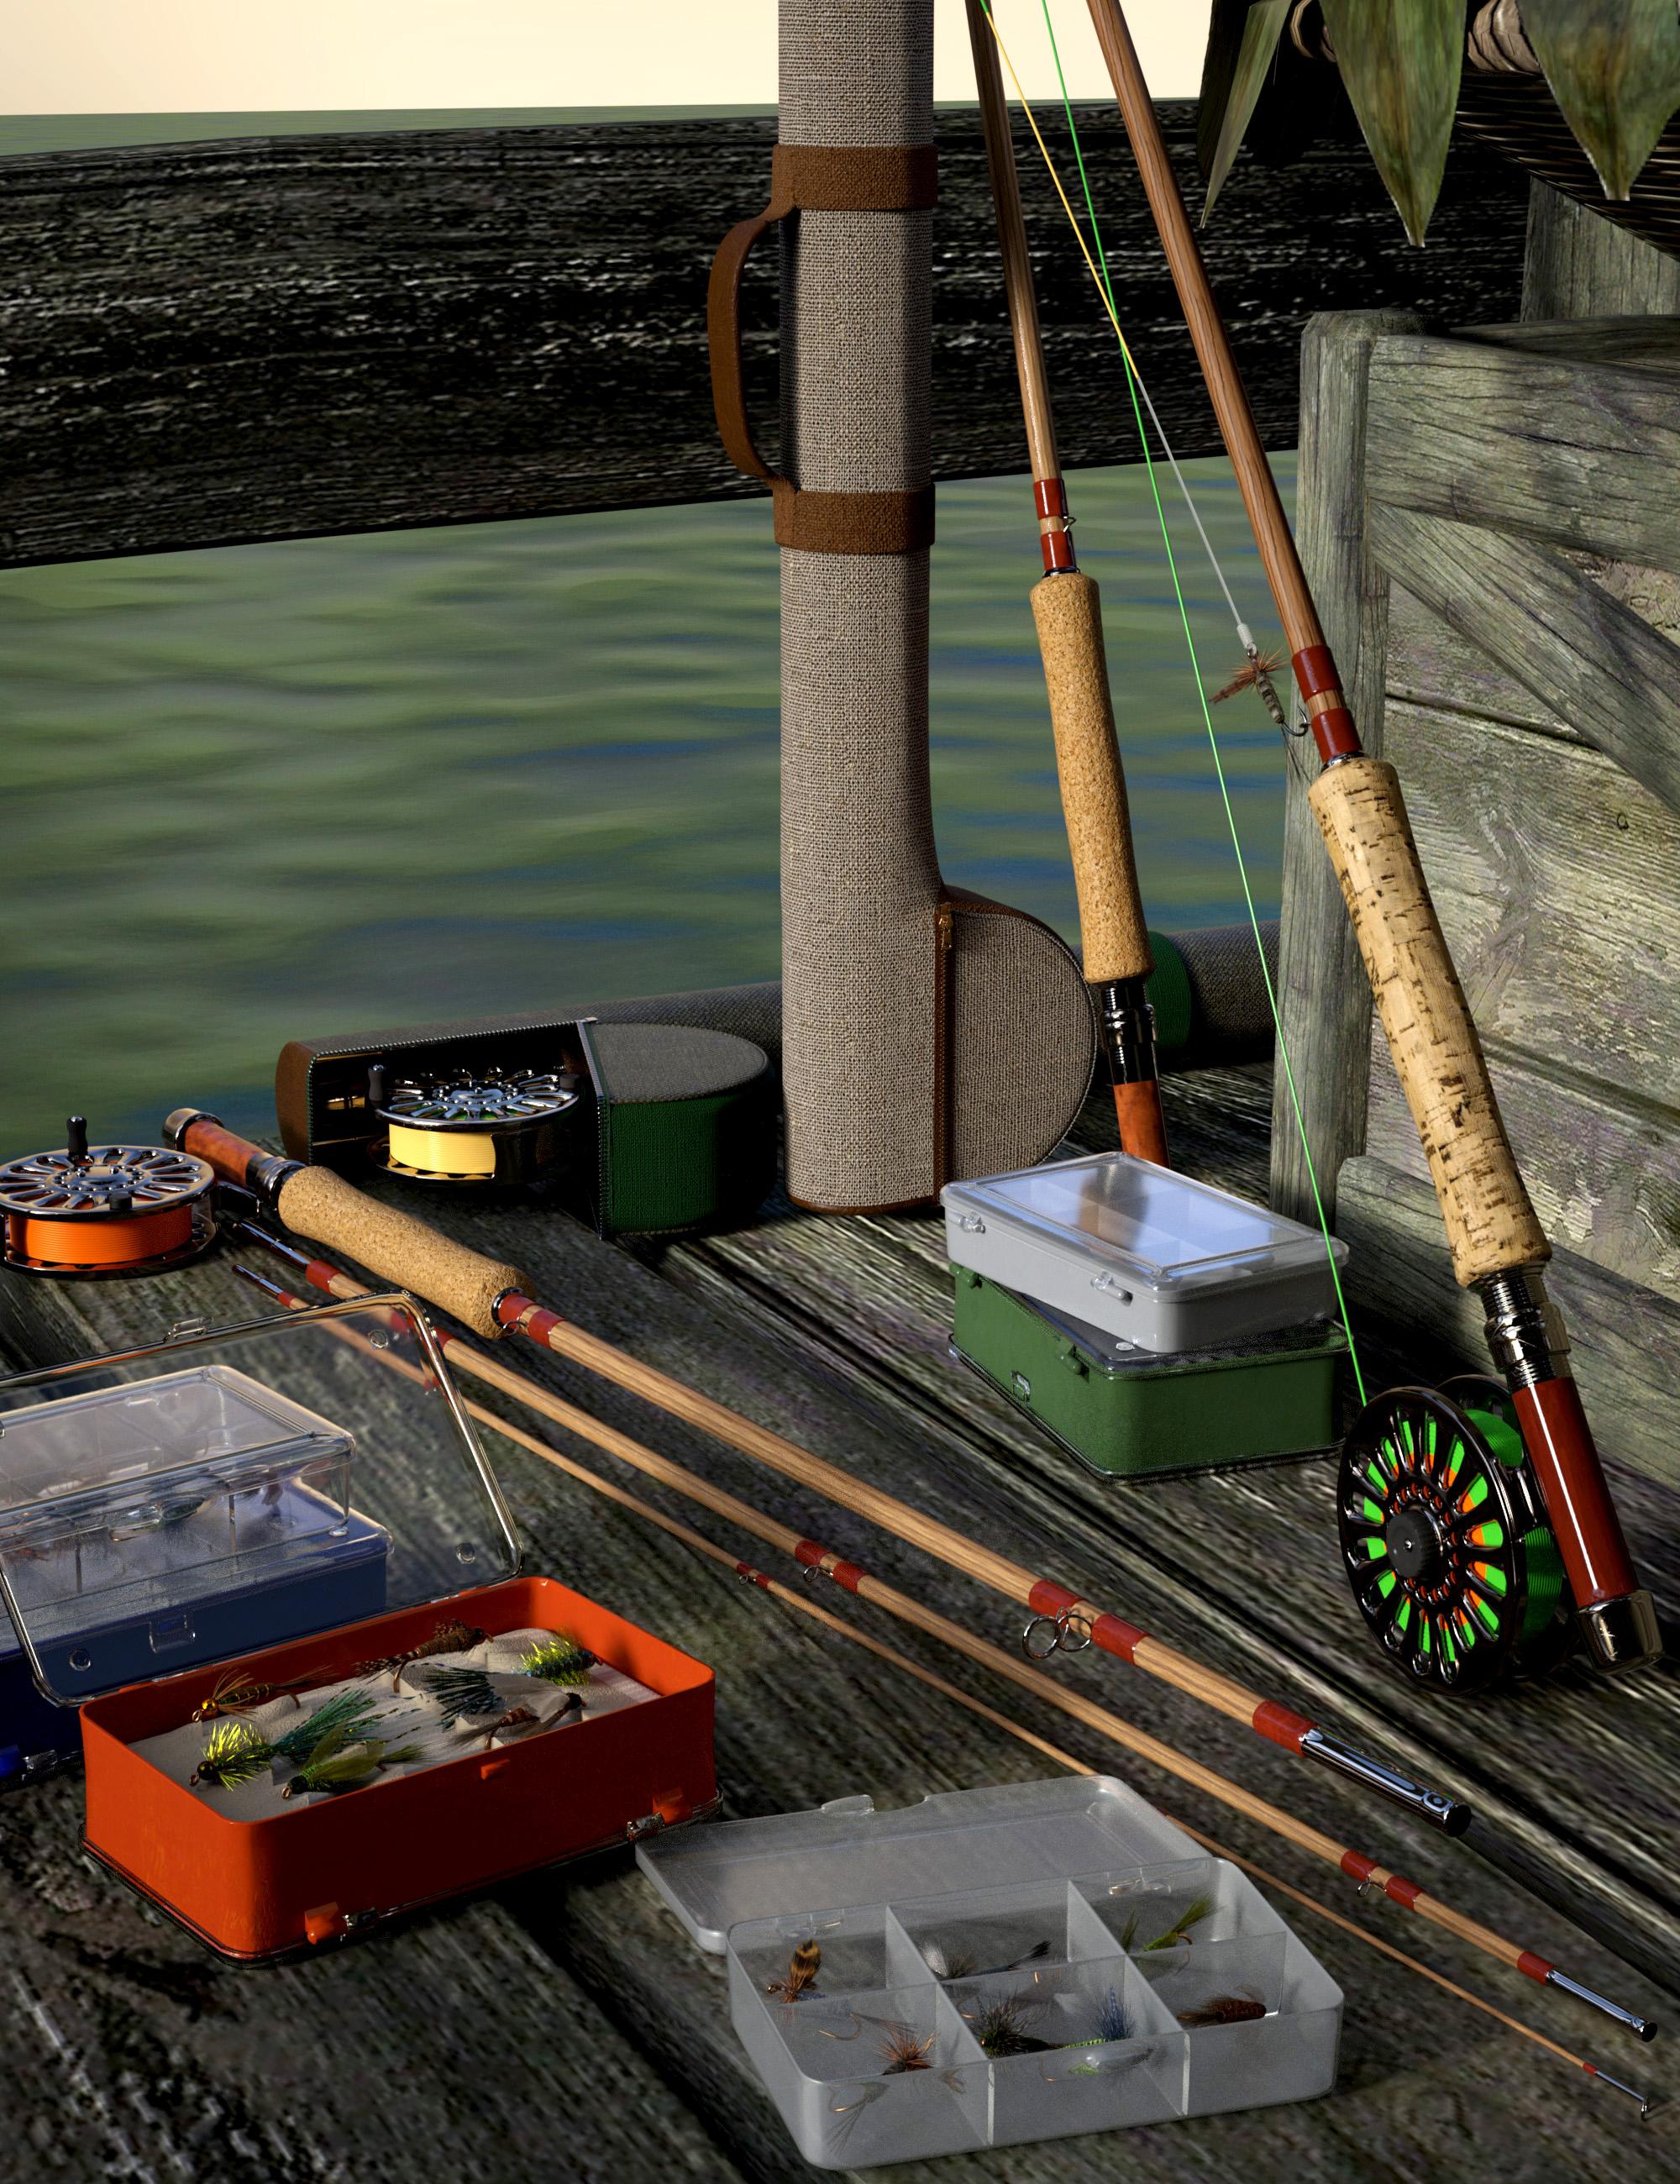 Fly Fishing Gear by: The Alchemist, 3D Models by Daz 3D